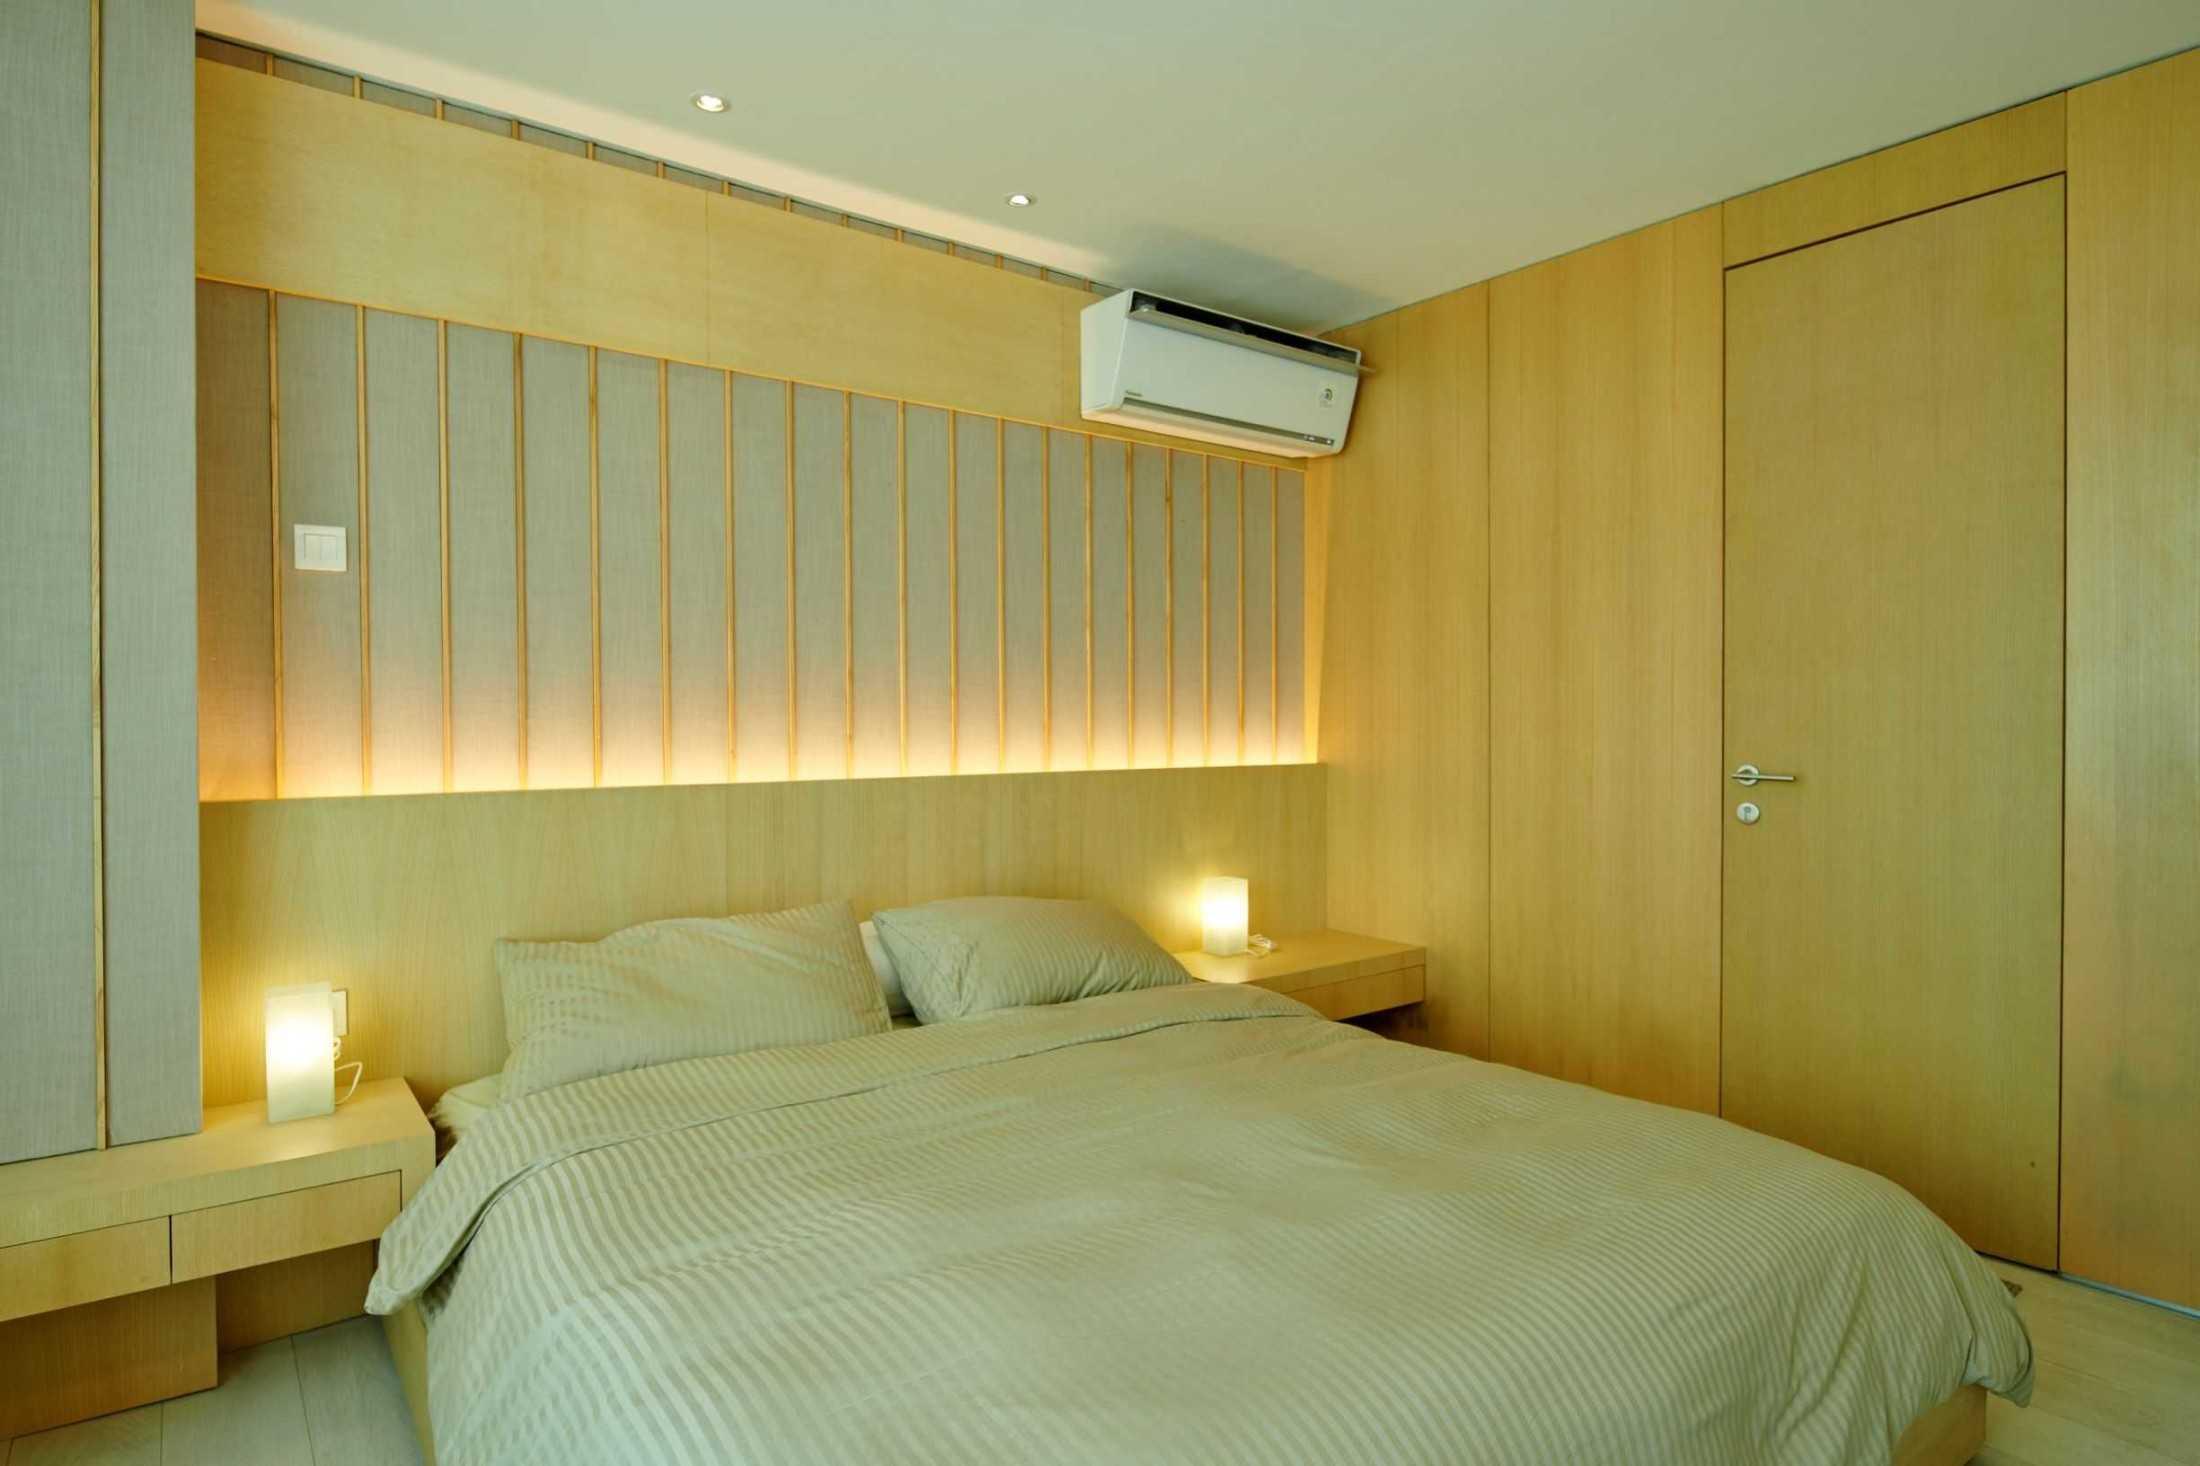 Hadivincent Architects Tb Apartment Lippo Cikarang, Bekasi, Jawa Barat, Indonesia Lippo Cikarang, Bekasi, Jawa Barat, Indonesia Hadi-Vincent-Architects-Tb-Apartment  71000